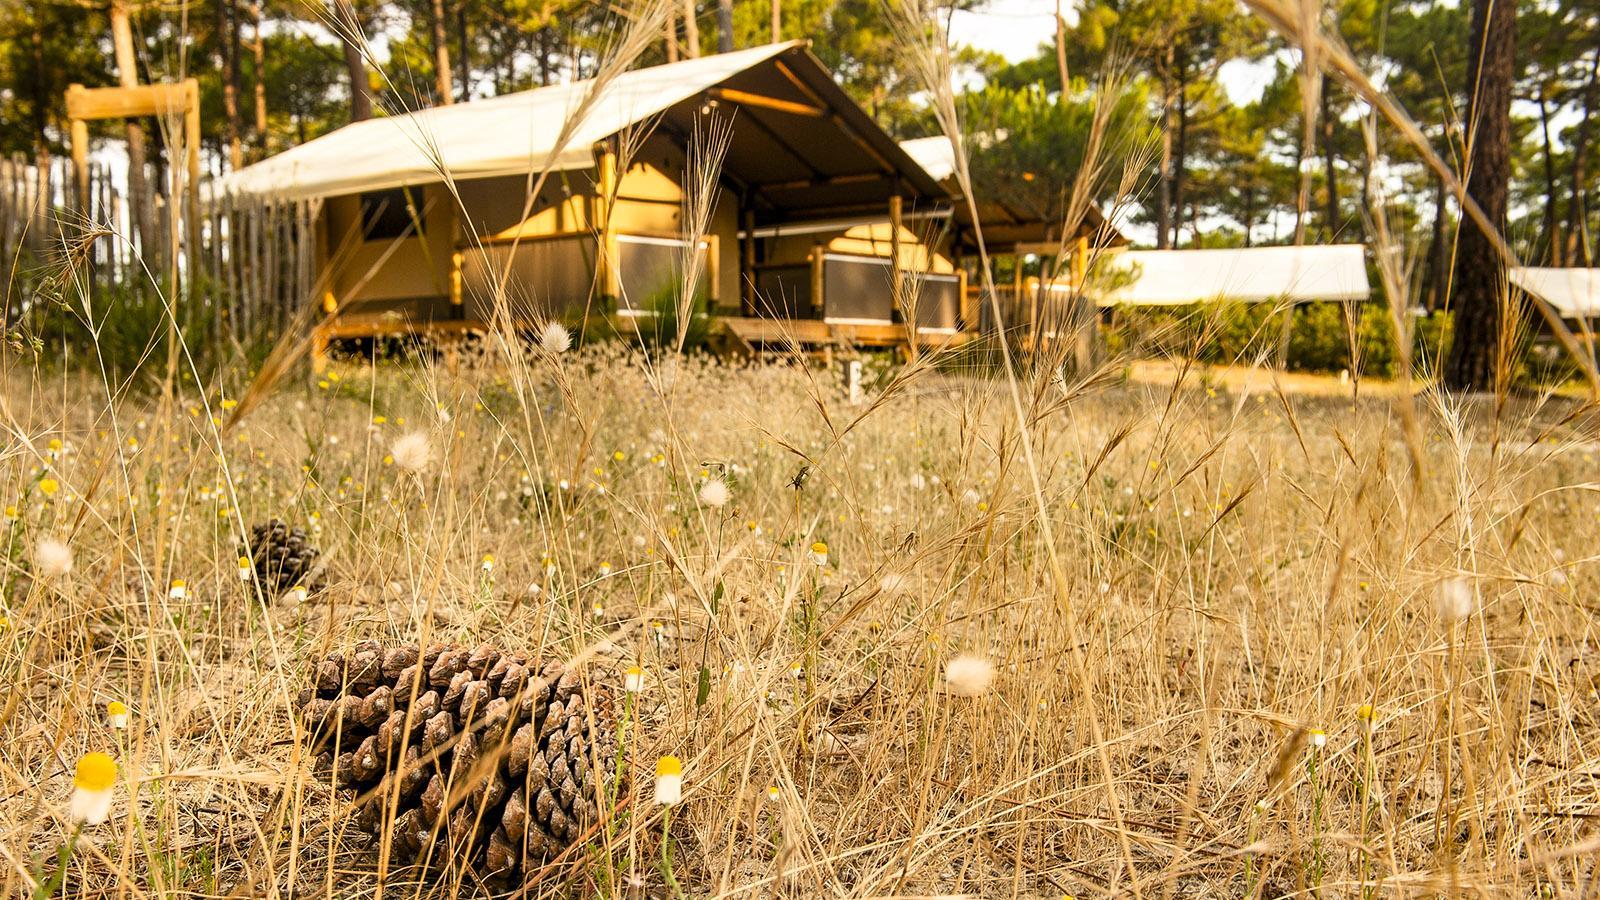 Carcans-Plage. Camping de l'Océan. Foto: Hilke Maunder